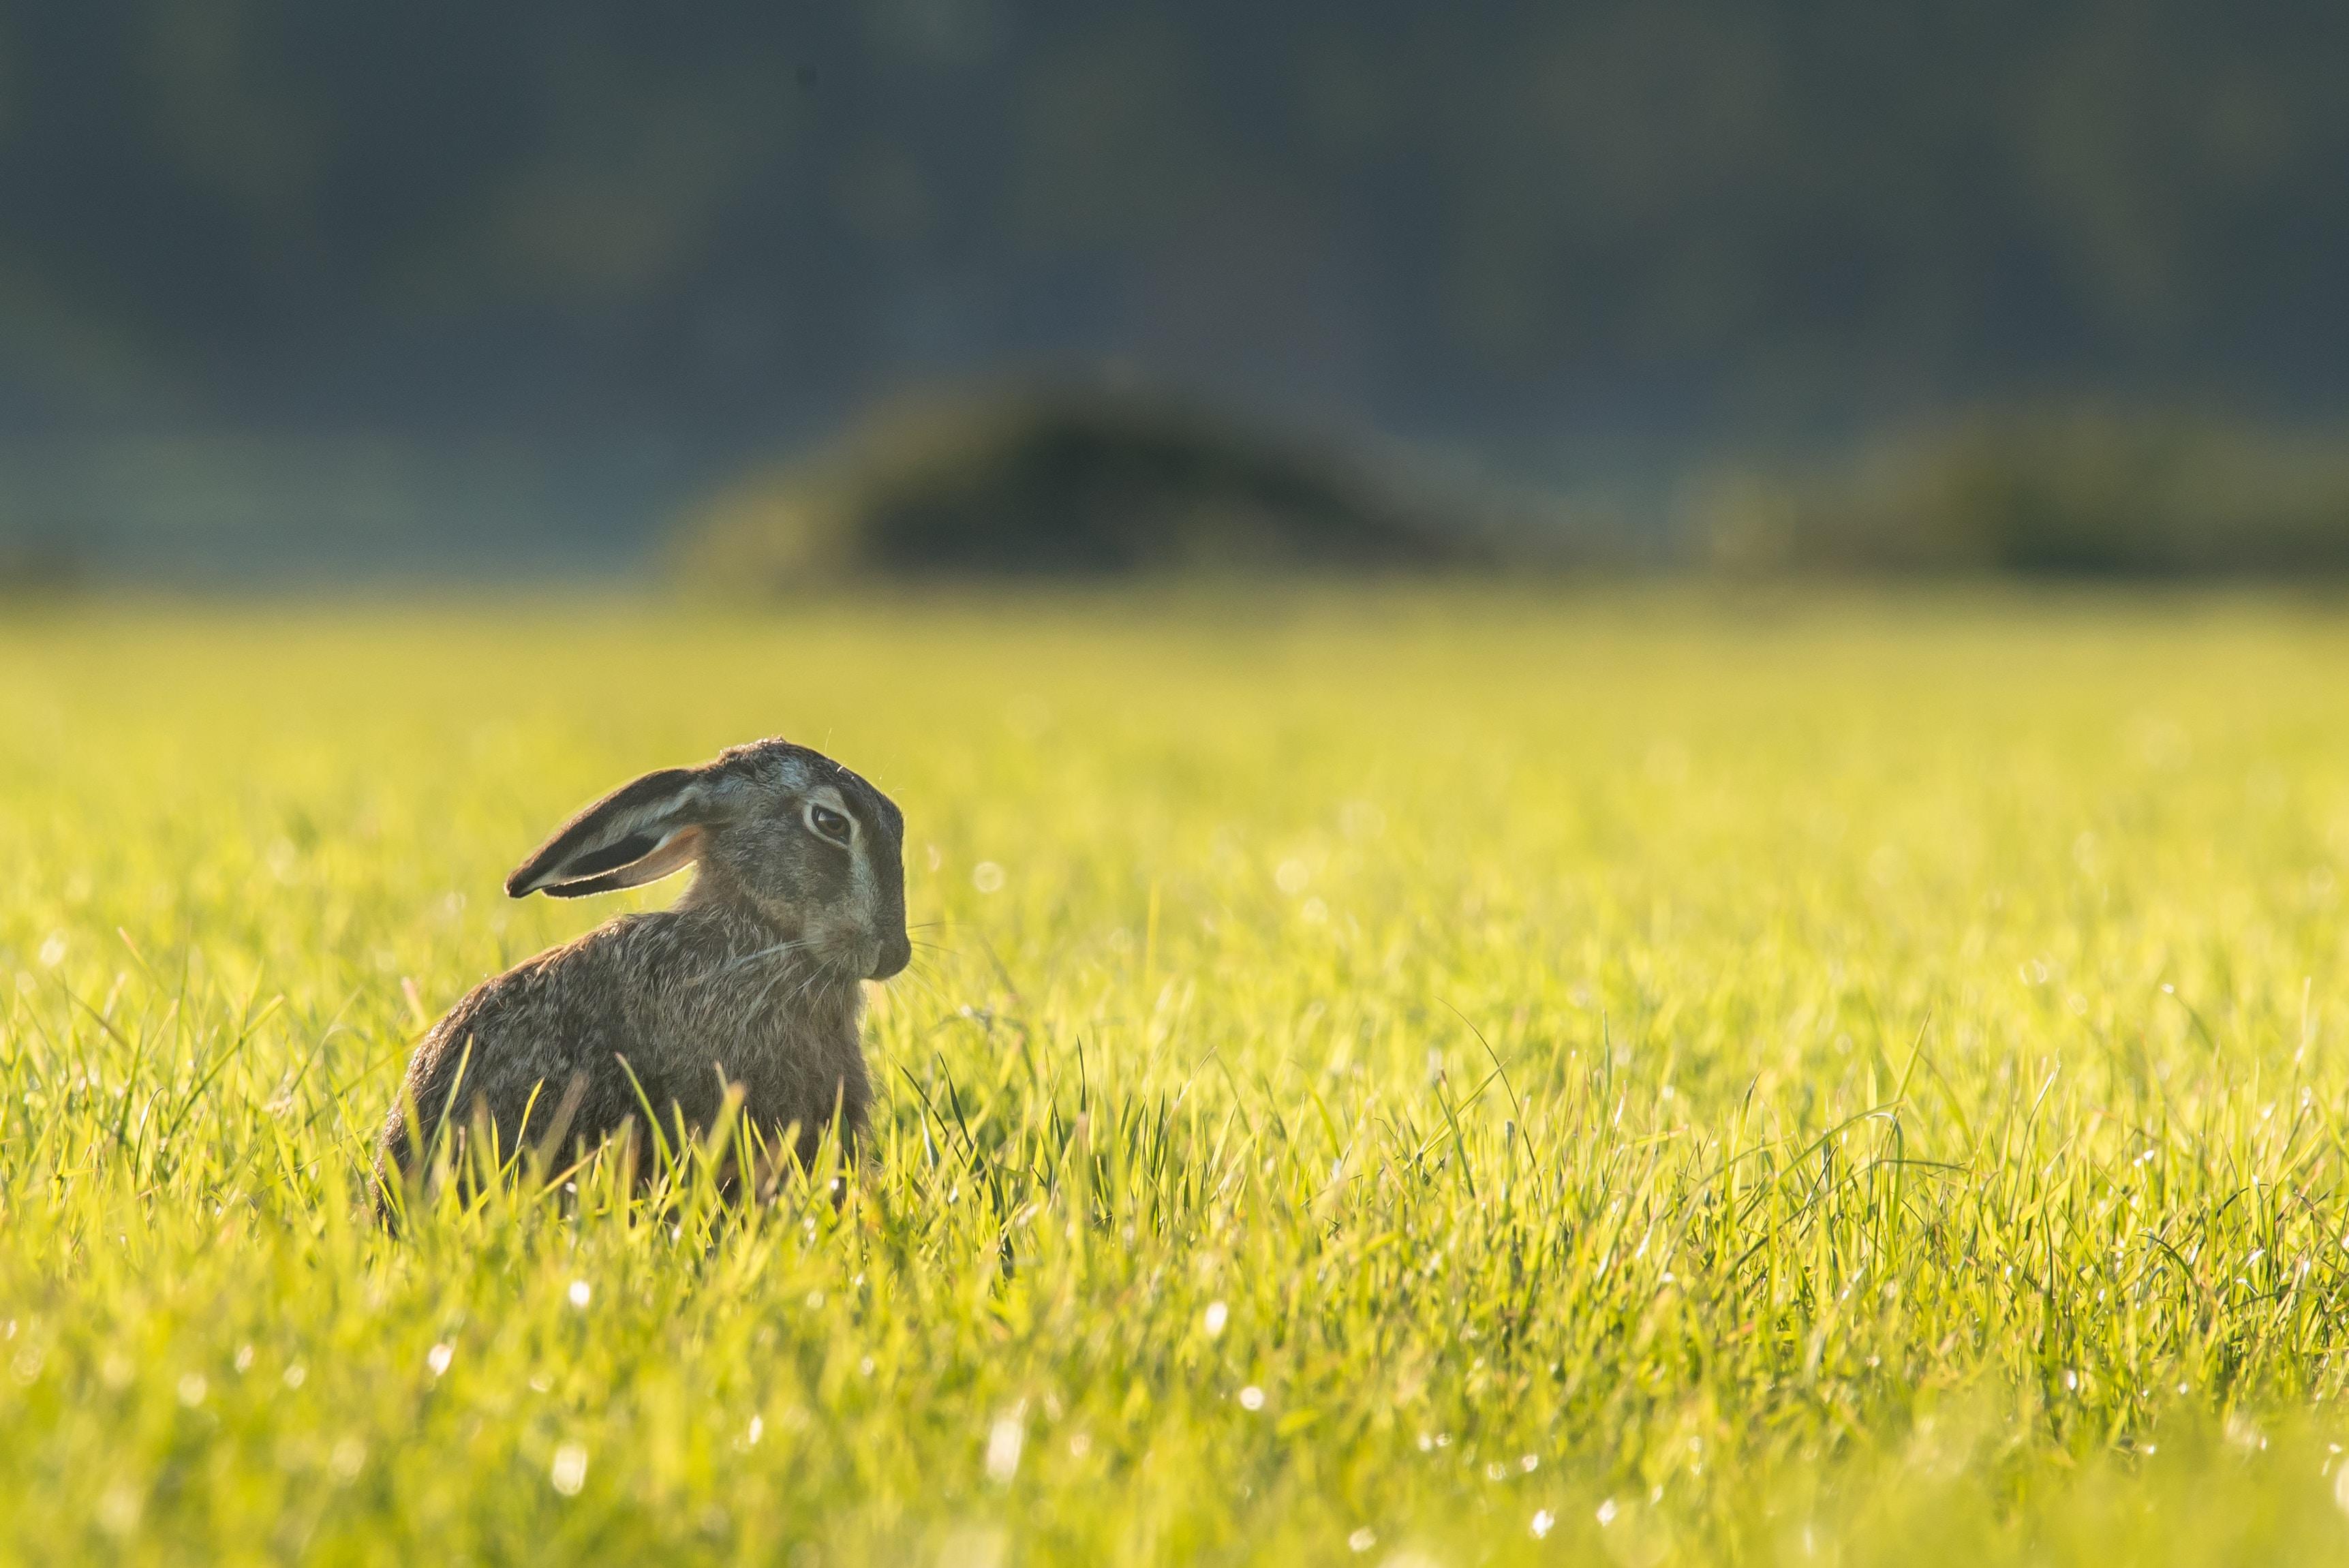 gray rabbit on grass